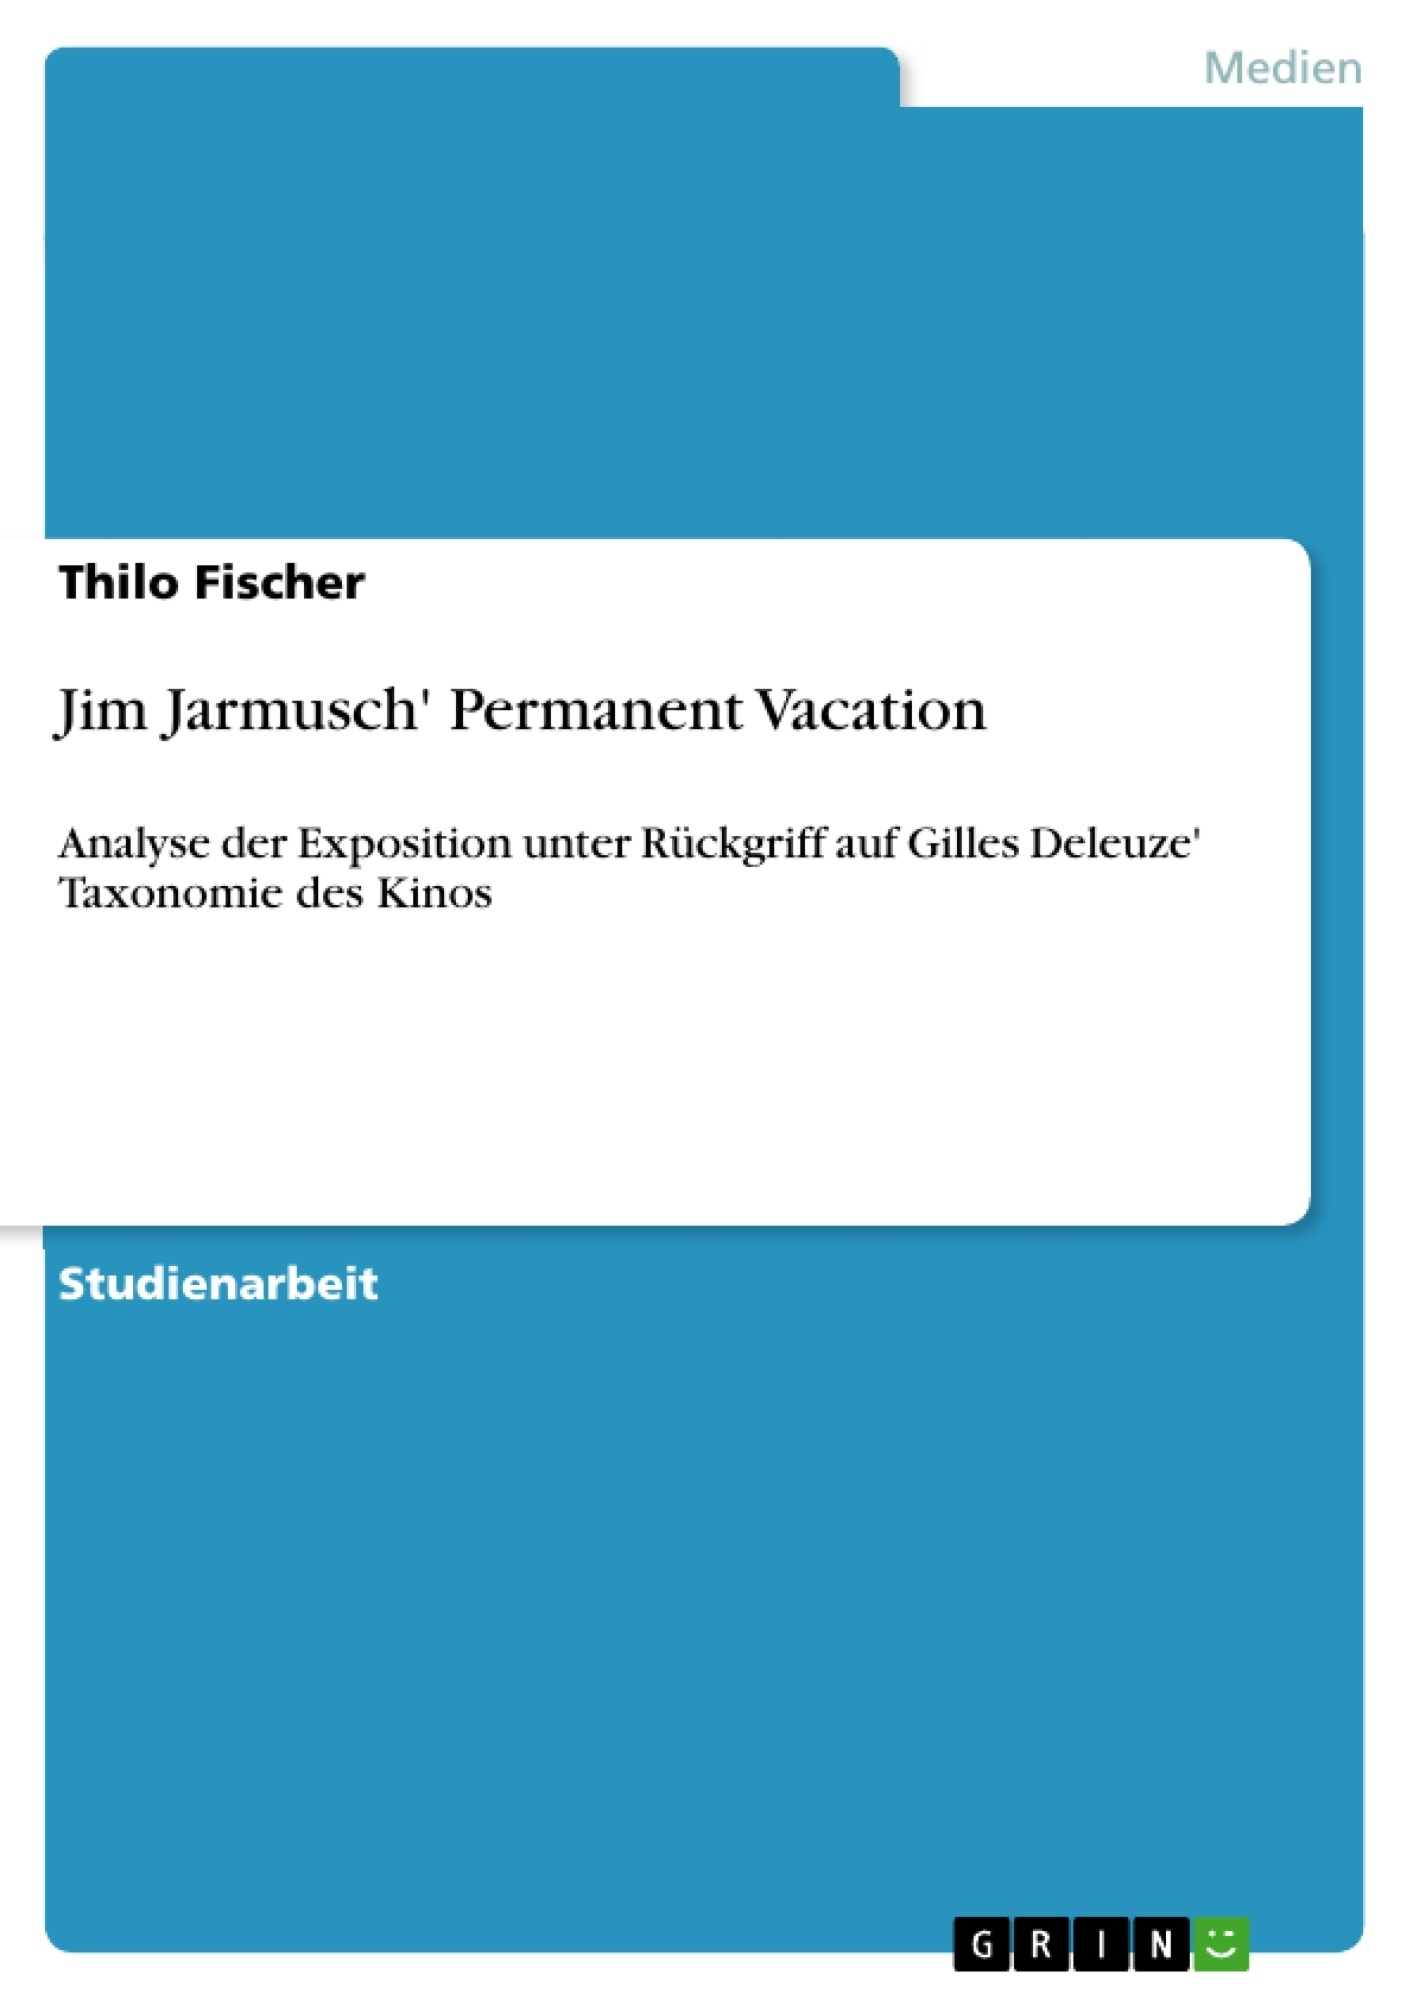 Titel: Jim Jarmusch' Permanent Vacation